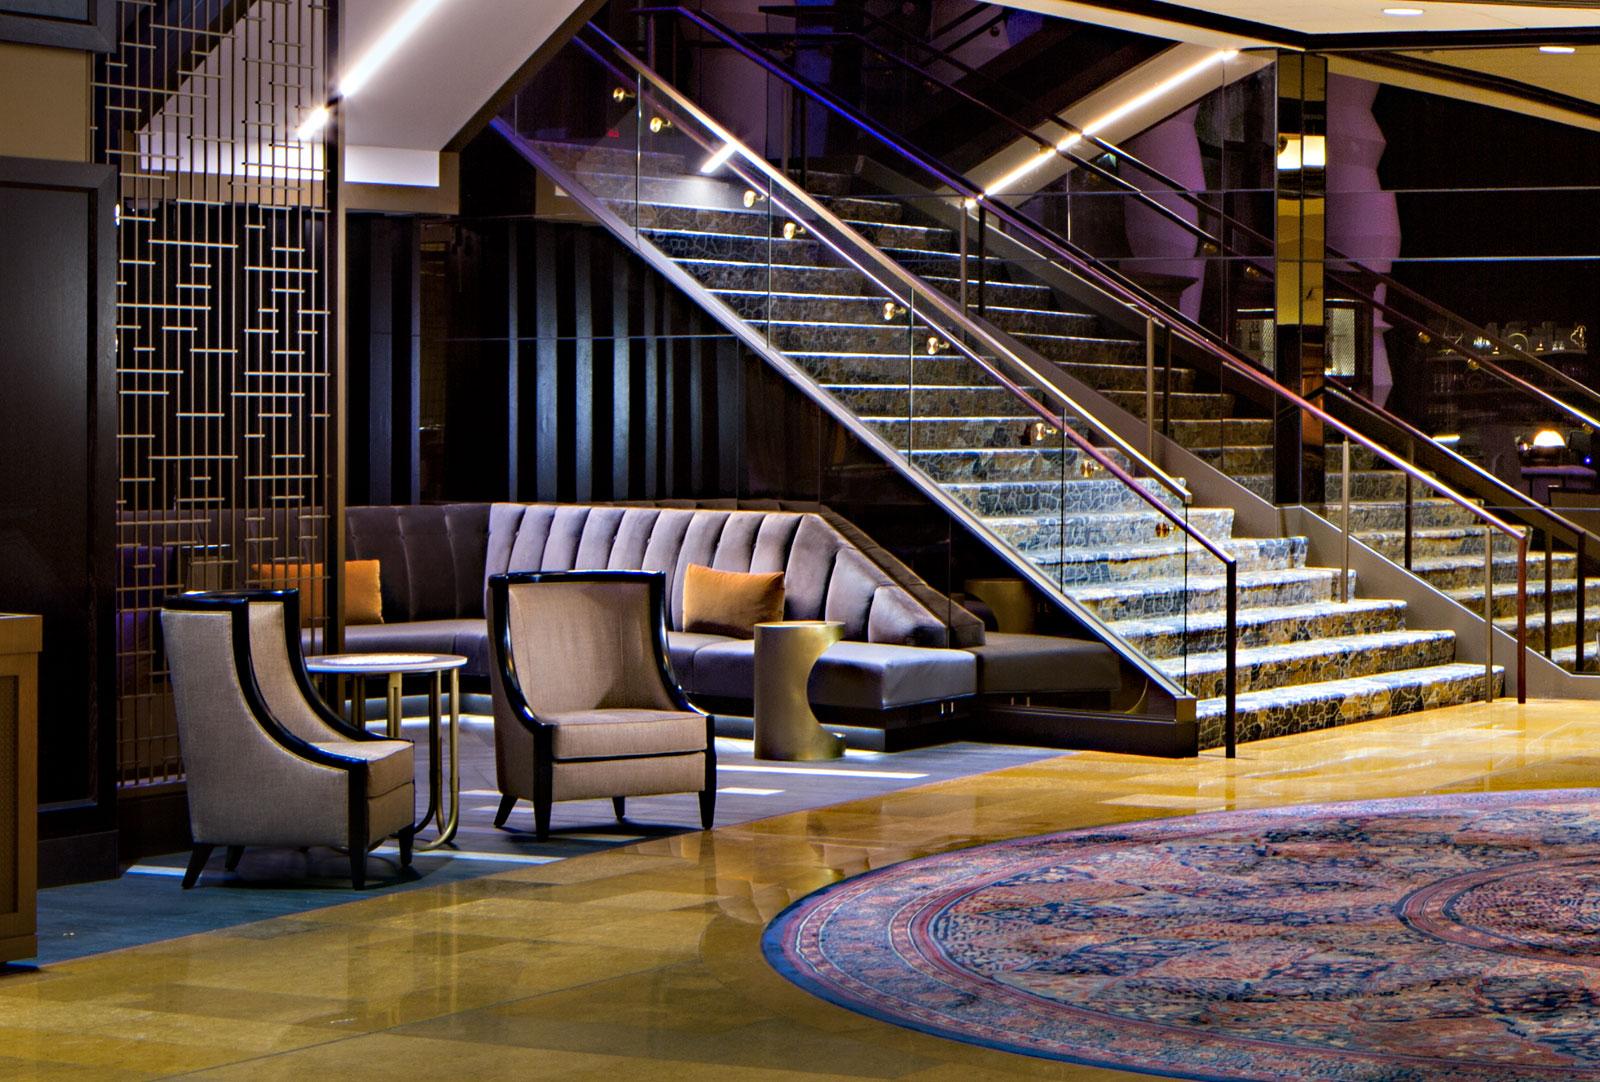 Rendezvous Lounge, Grand Rapids MI